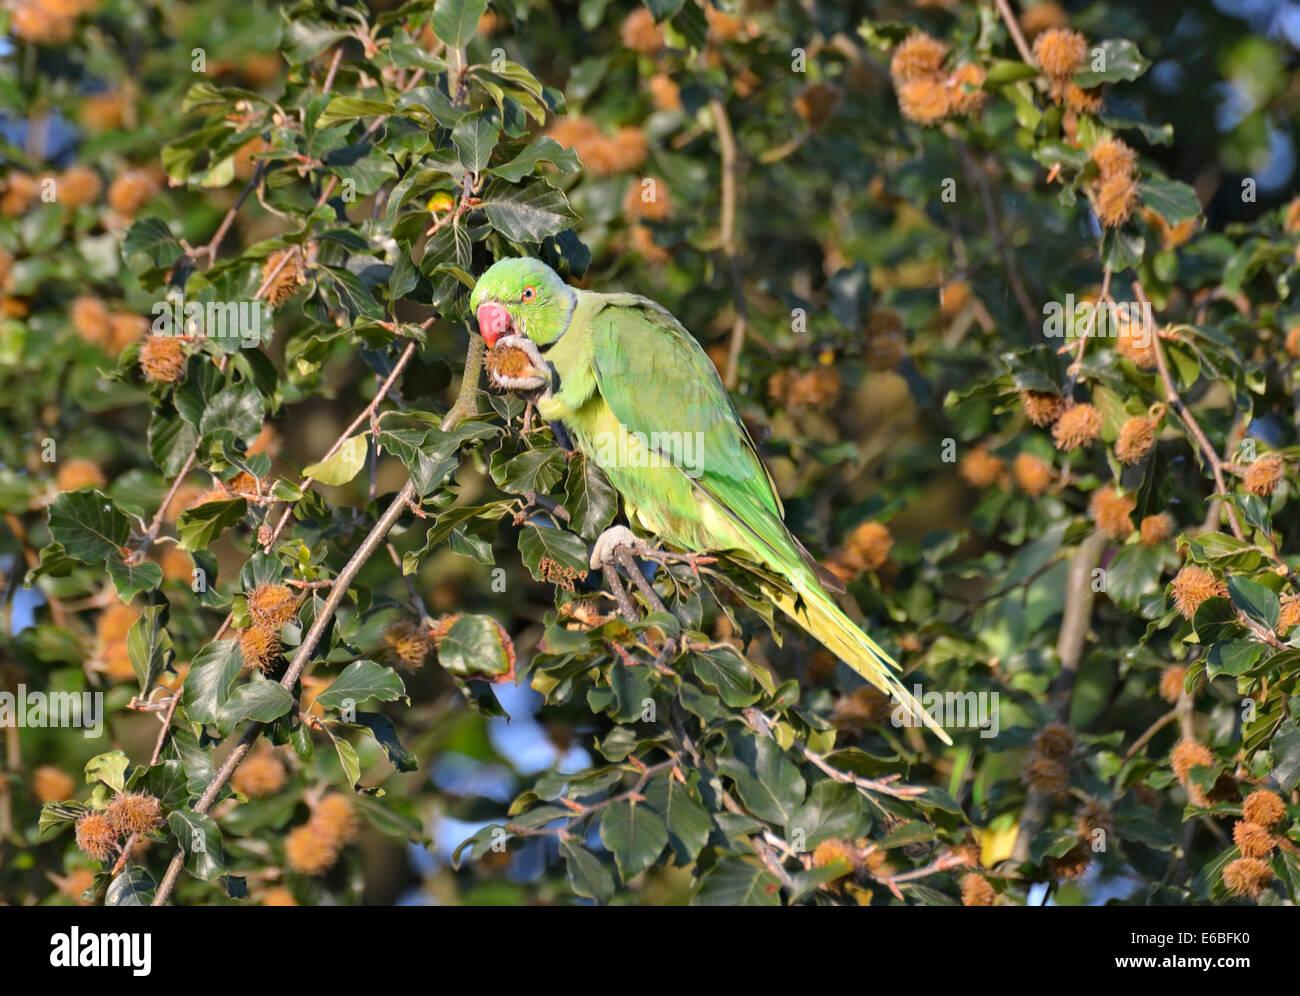 Ring necked (or rose ringed) parakeet feeding on beech tree, London, UK - Stock Image